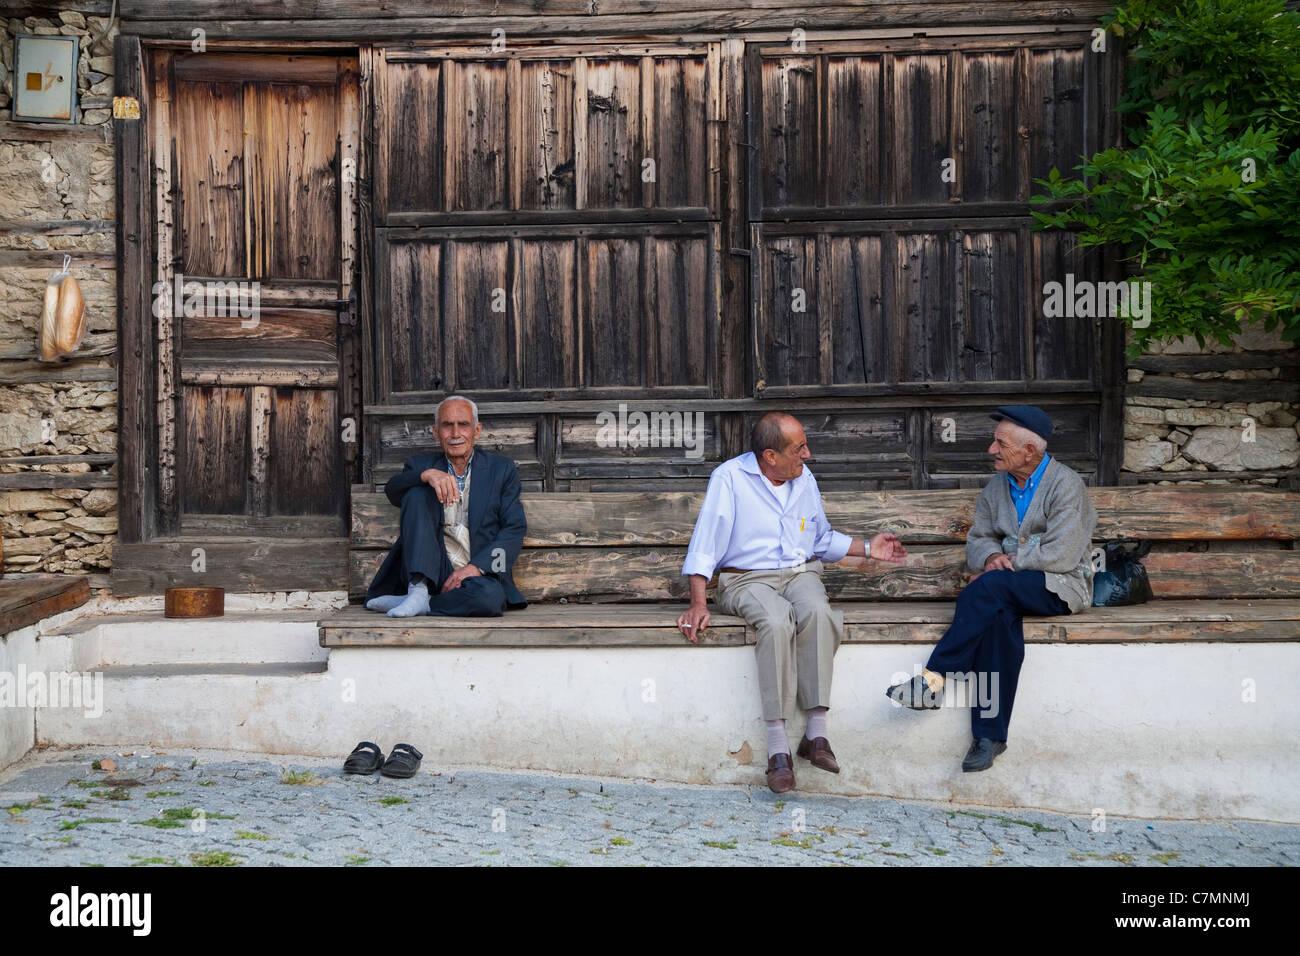 Local people in Urunlu Village Antalya Turkey - Stock Image